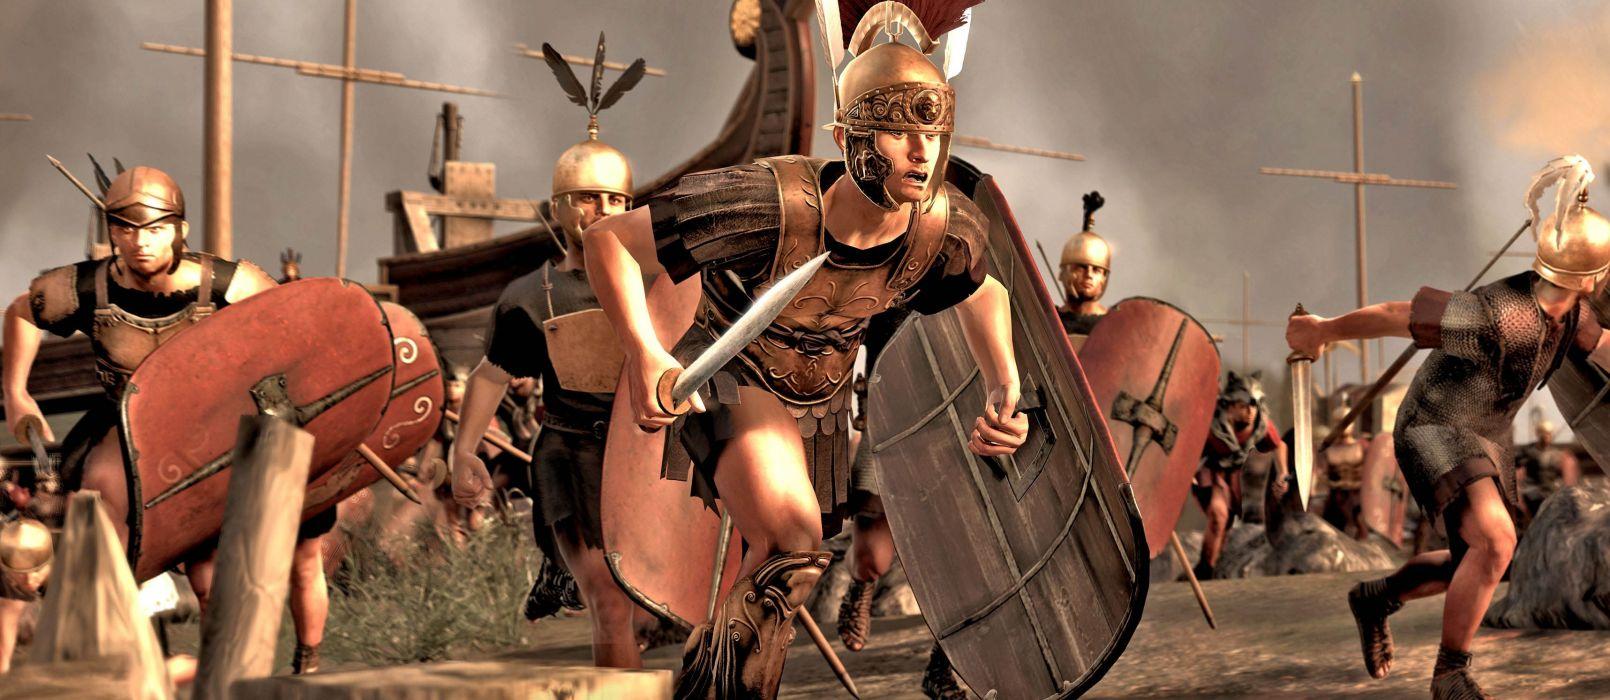 TOTAL WAR ROME action fantasy warrior armor       g wallpaper